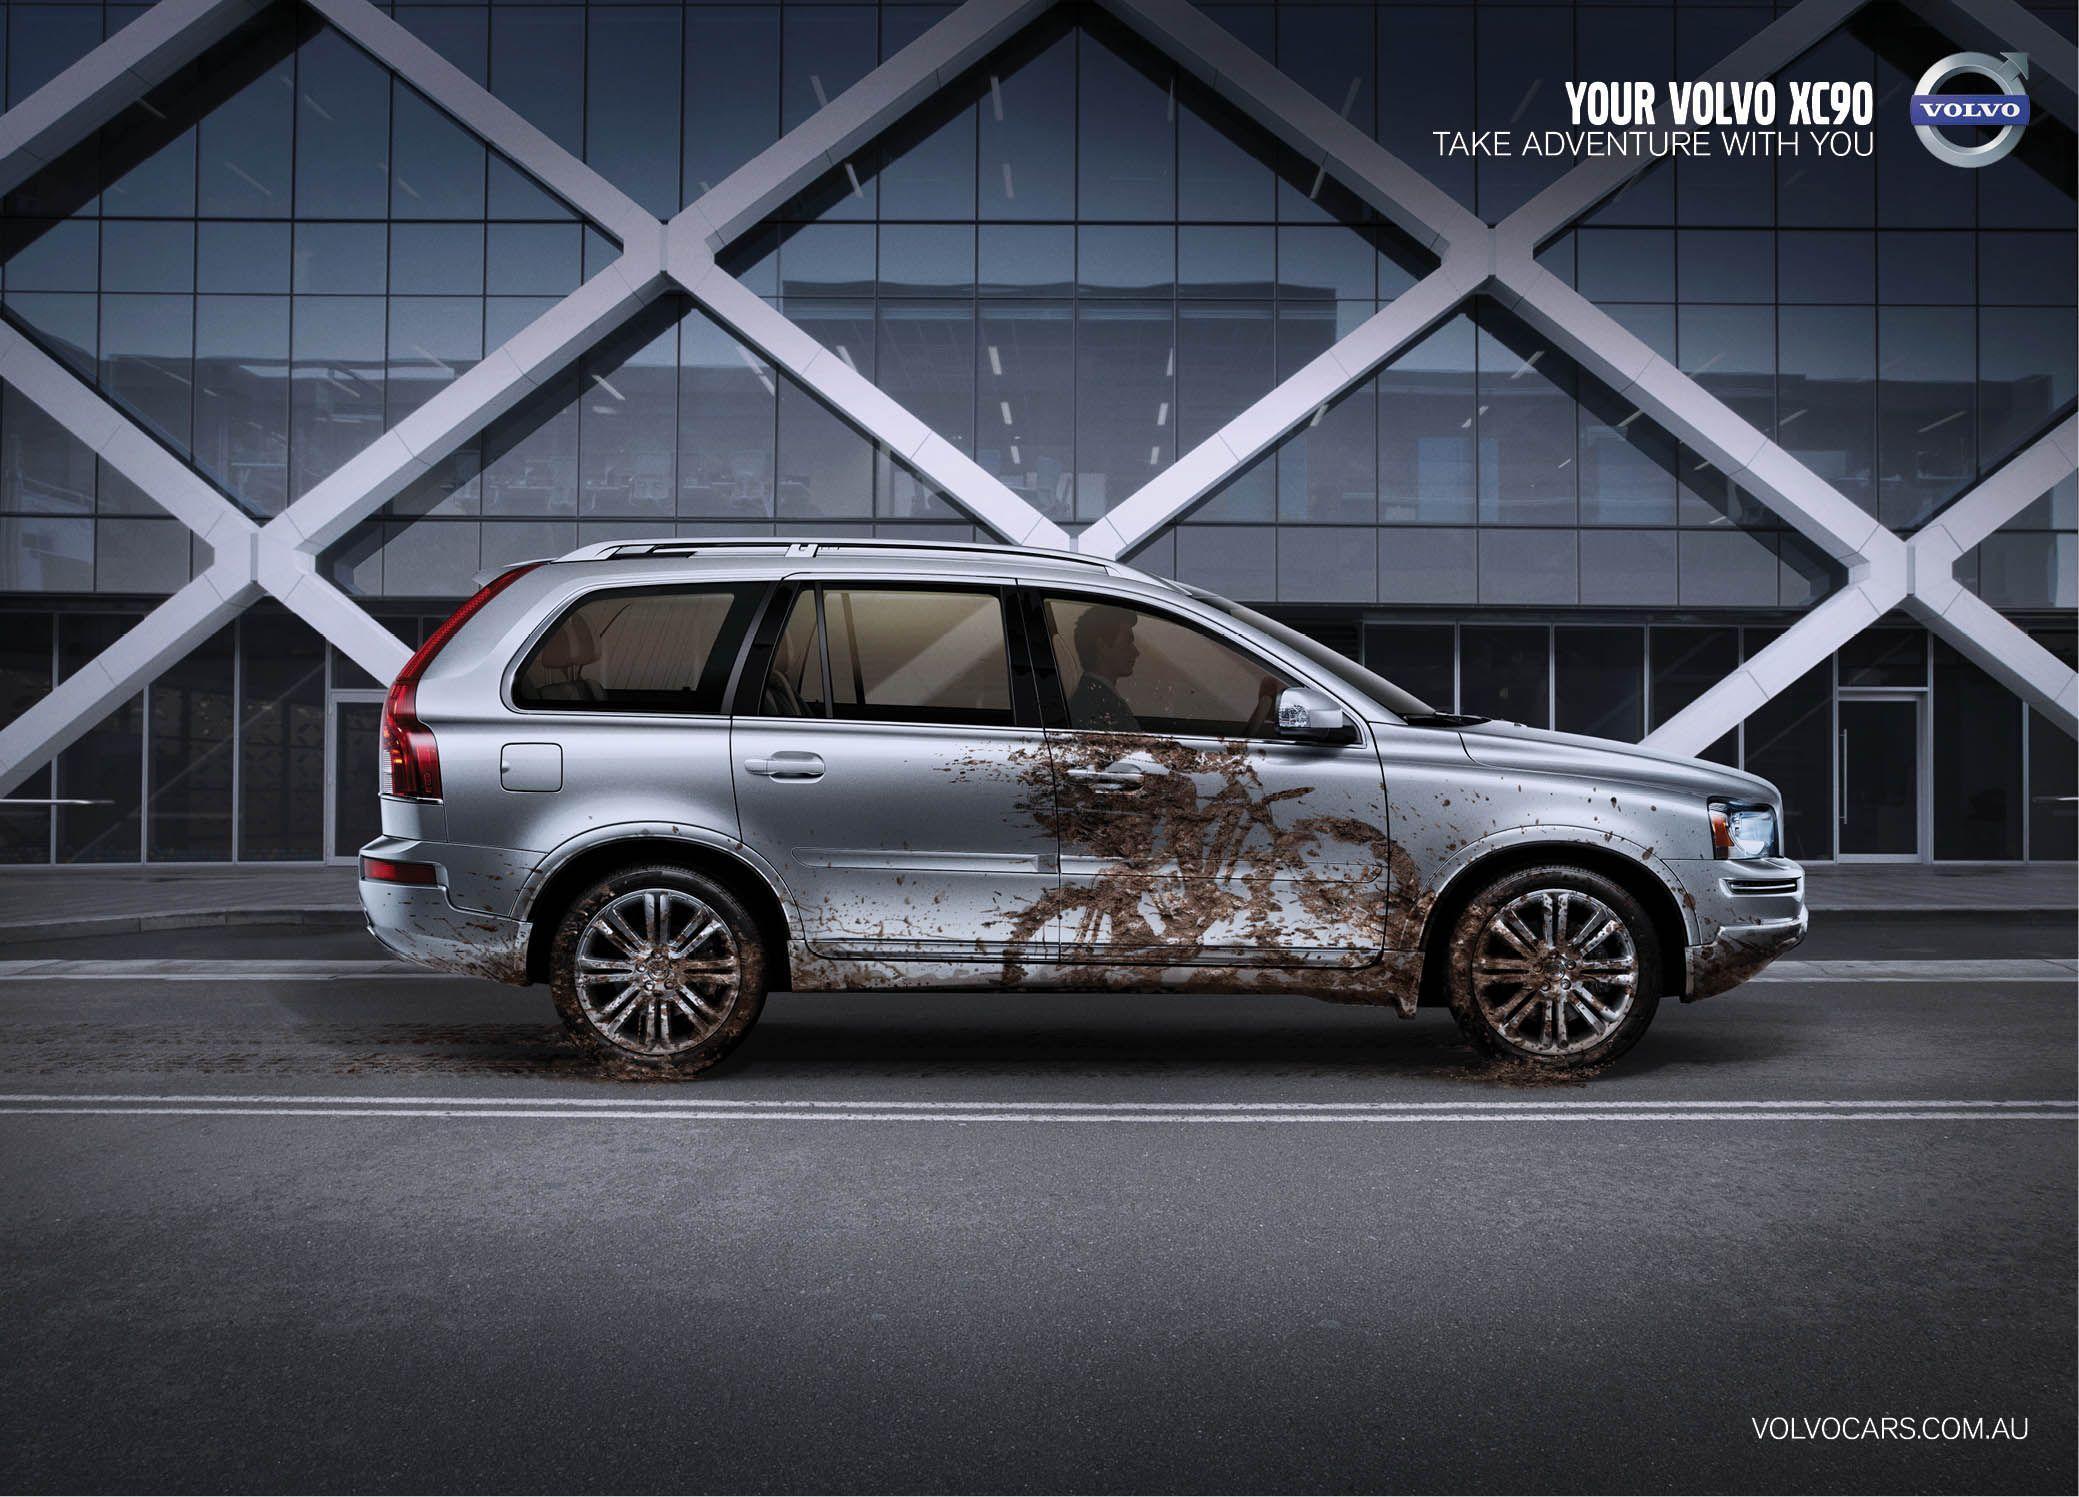 Vol Xc90 Mud Press Volvo Volvo Xc90 Volvo Xc